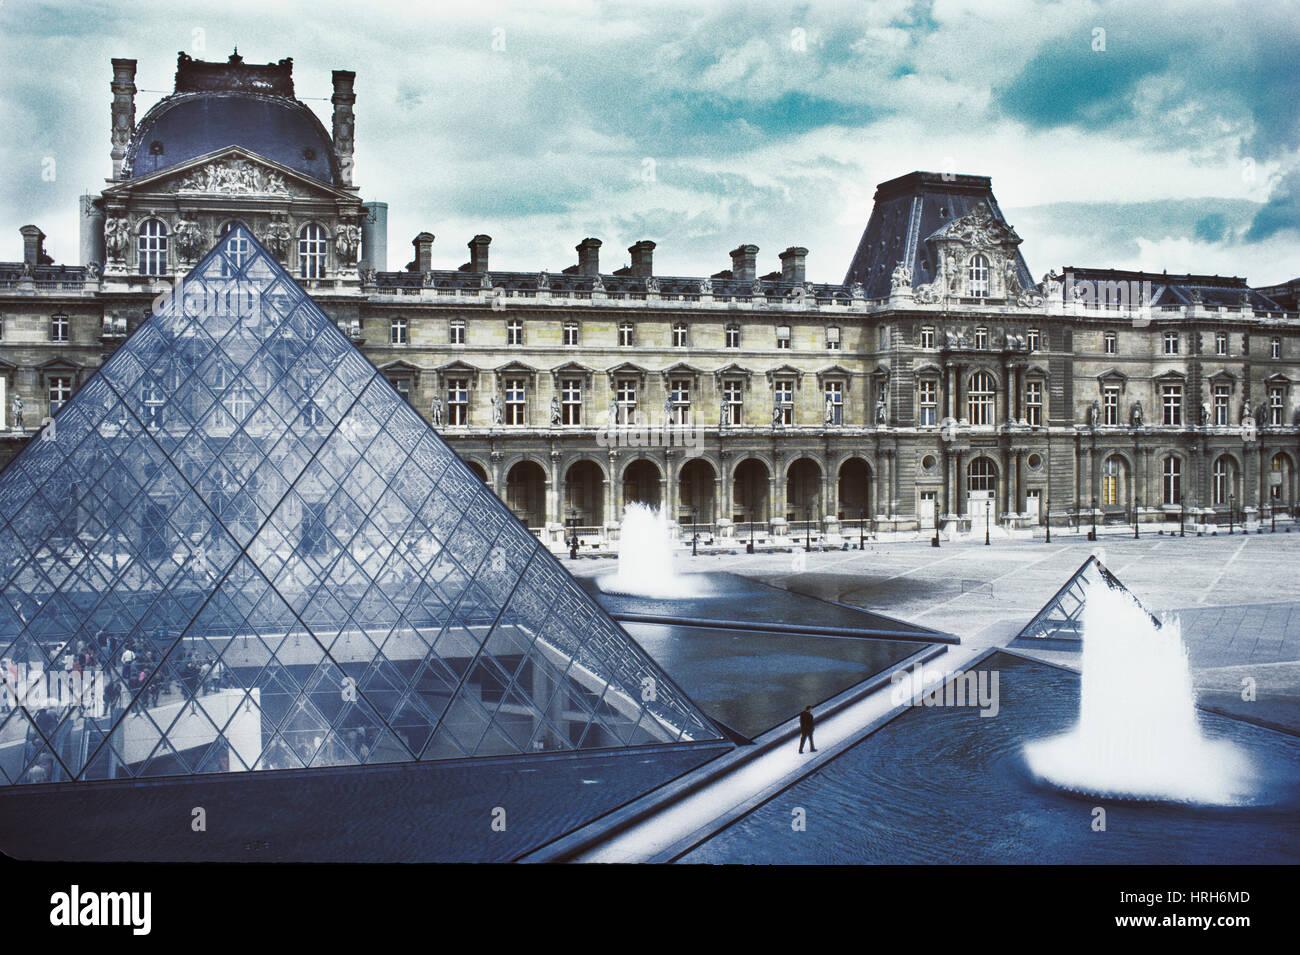 Mann, zu Fuß, Louvre, Paris, Frankreich Stockbild